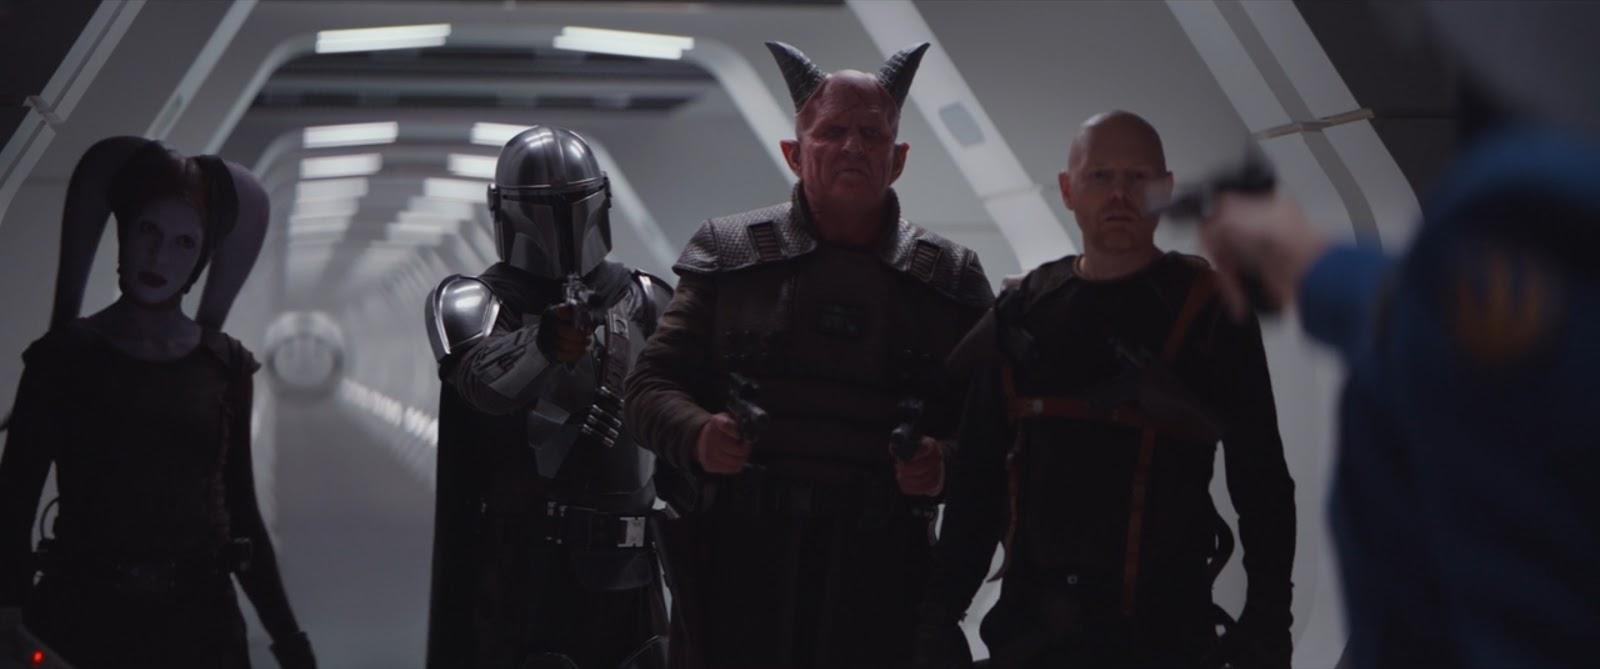 cast of the mandalorian episode 6